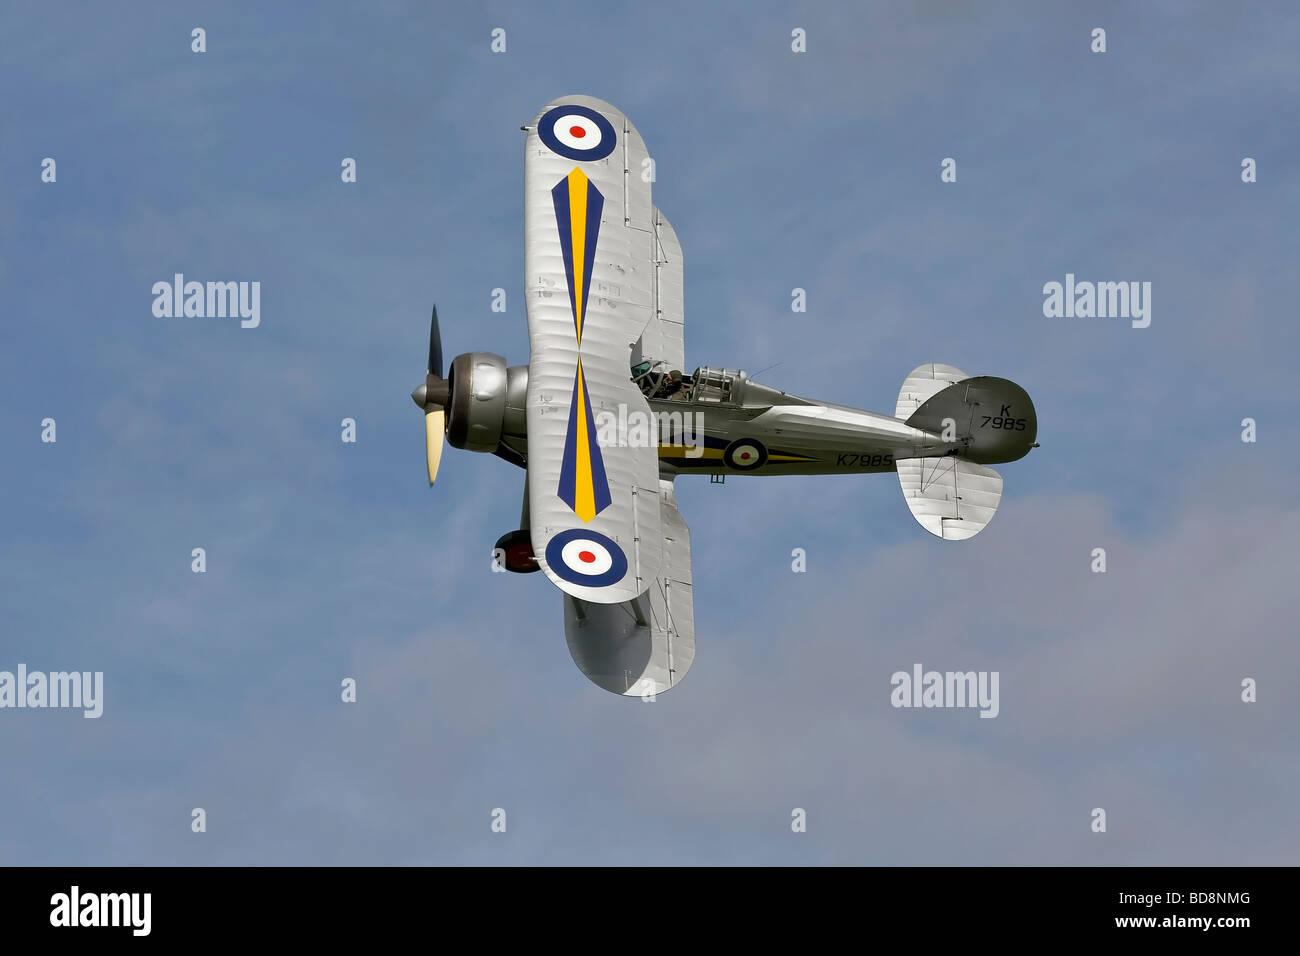 An RAF Gloster Gladiator biplane fighter - Stock Image